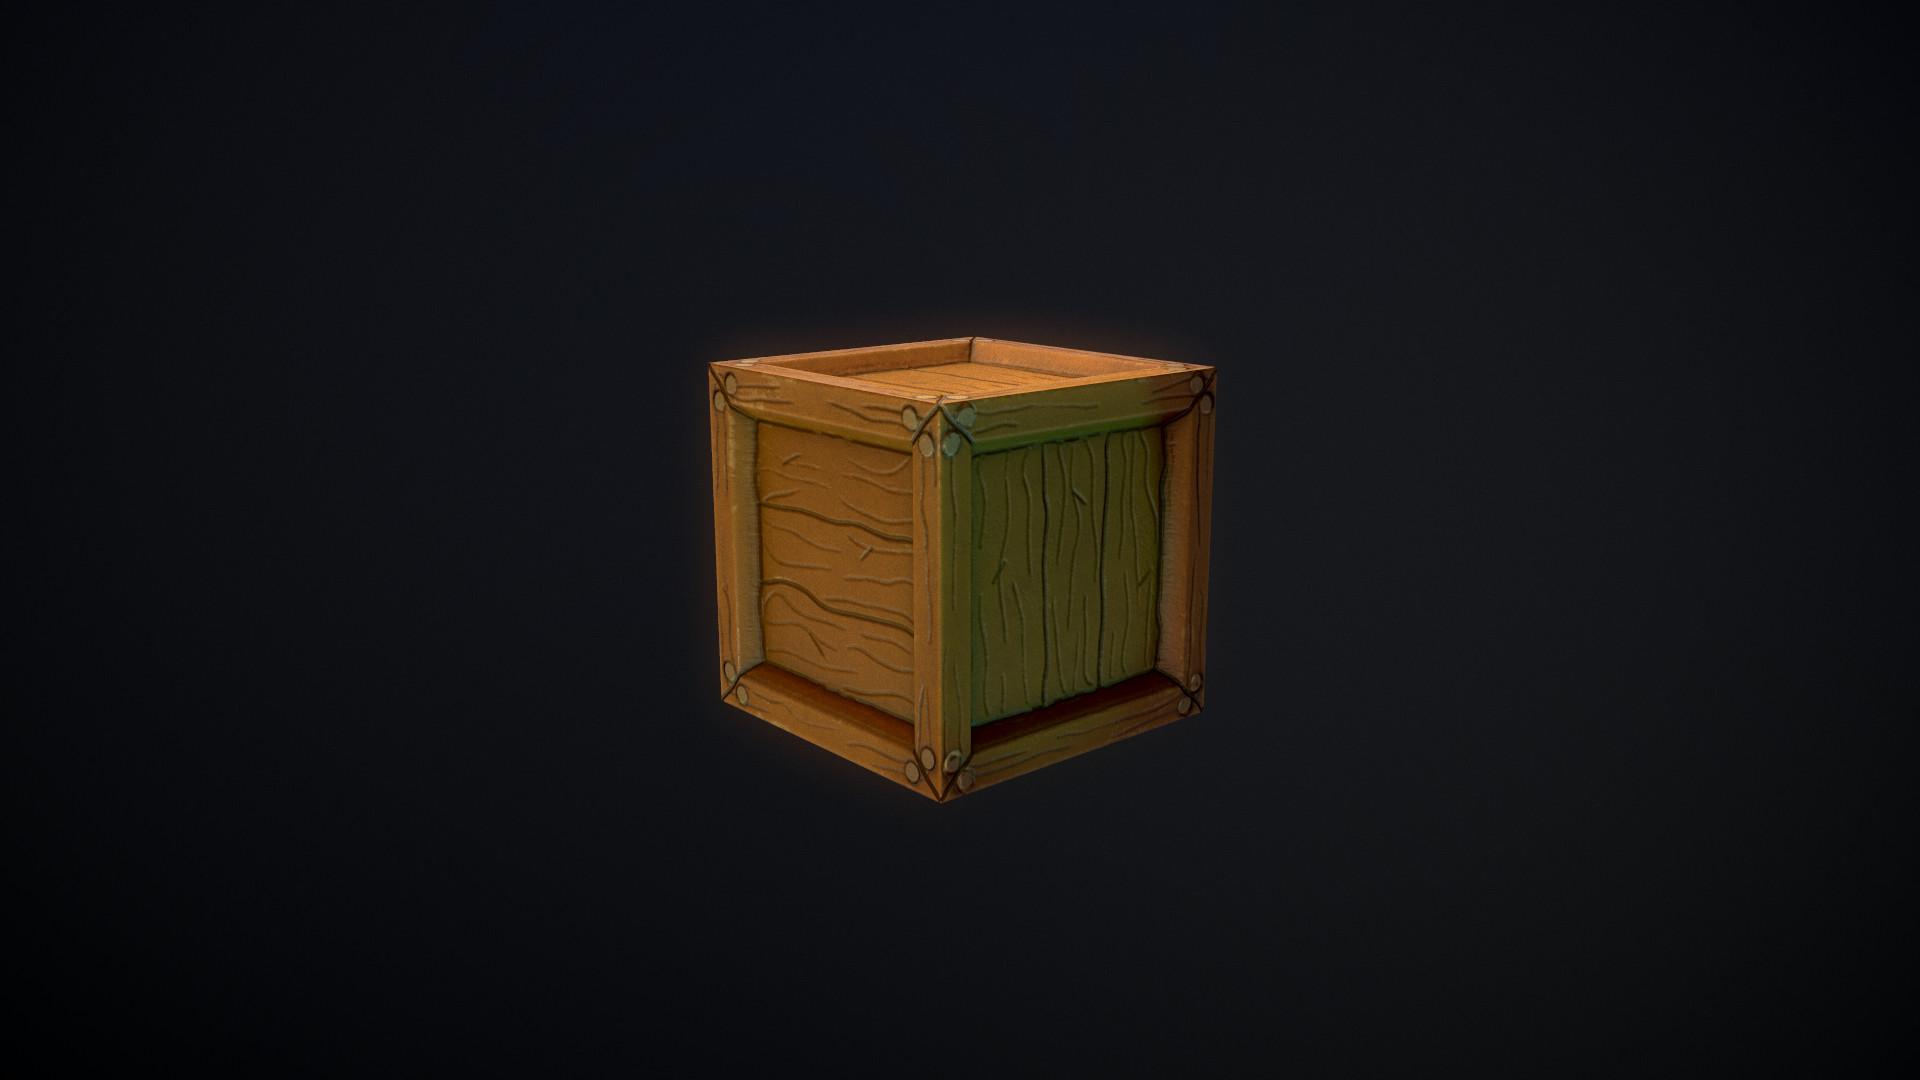 Stylized Crate